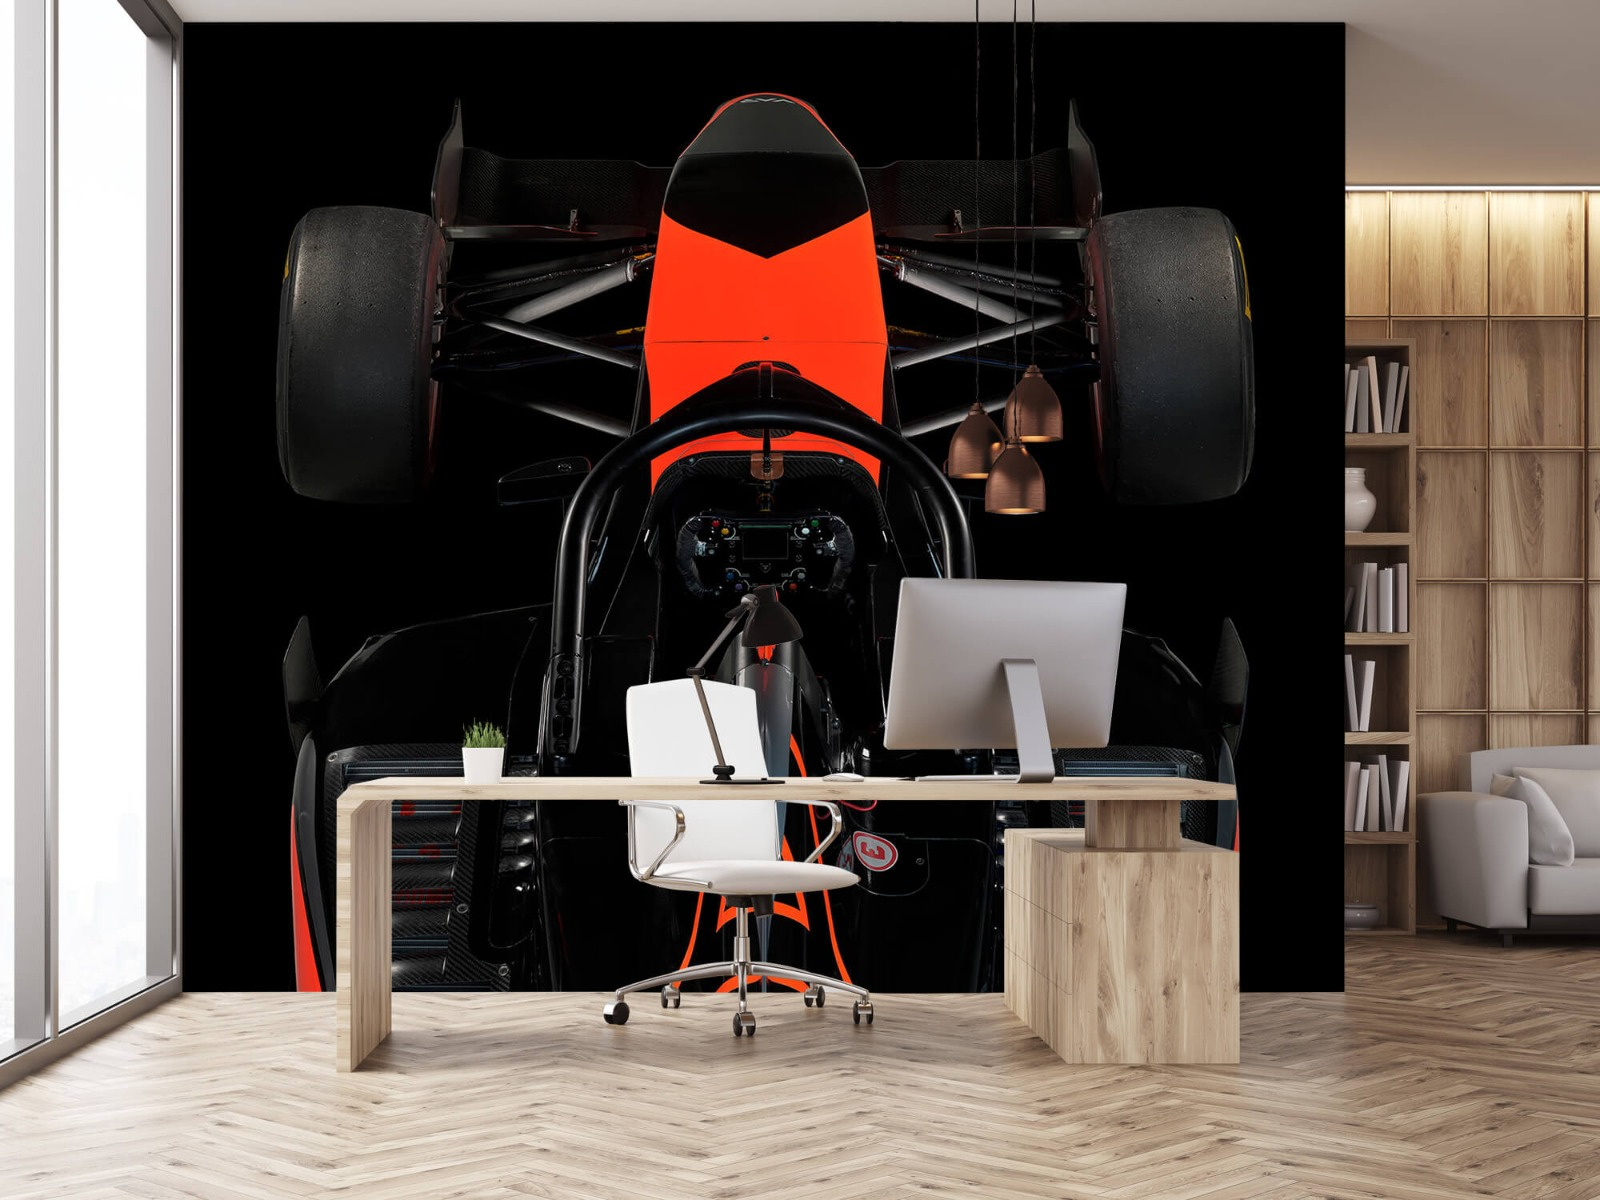 Sportauto's - Formule 3 - Cockpit view - dark - Tienerkamer 24